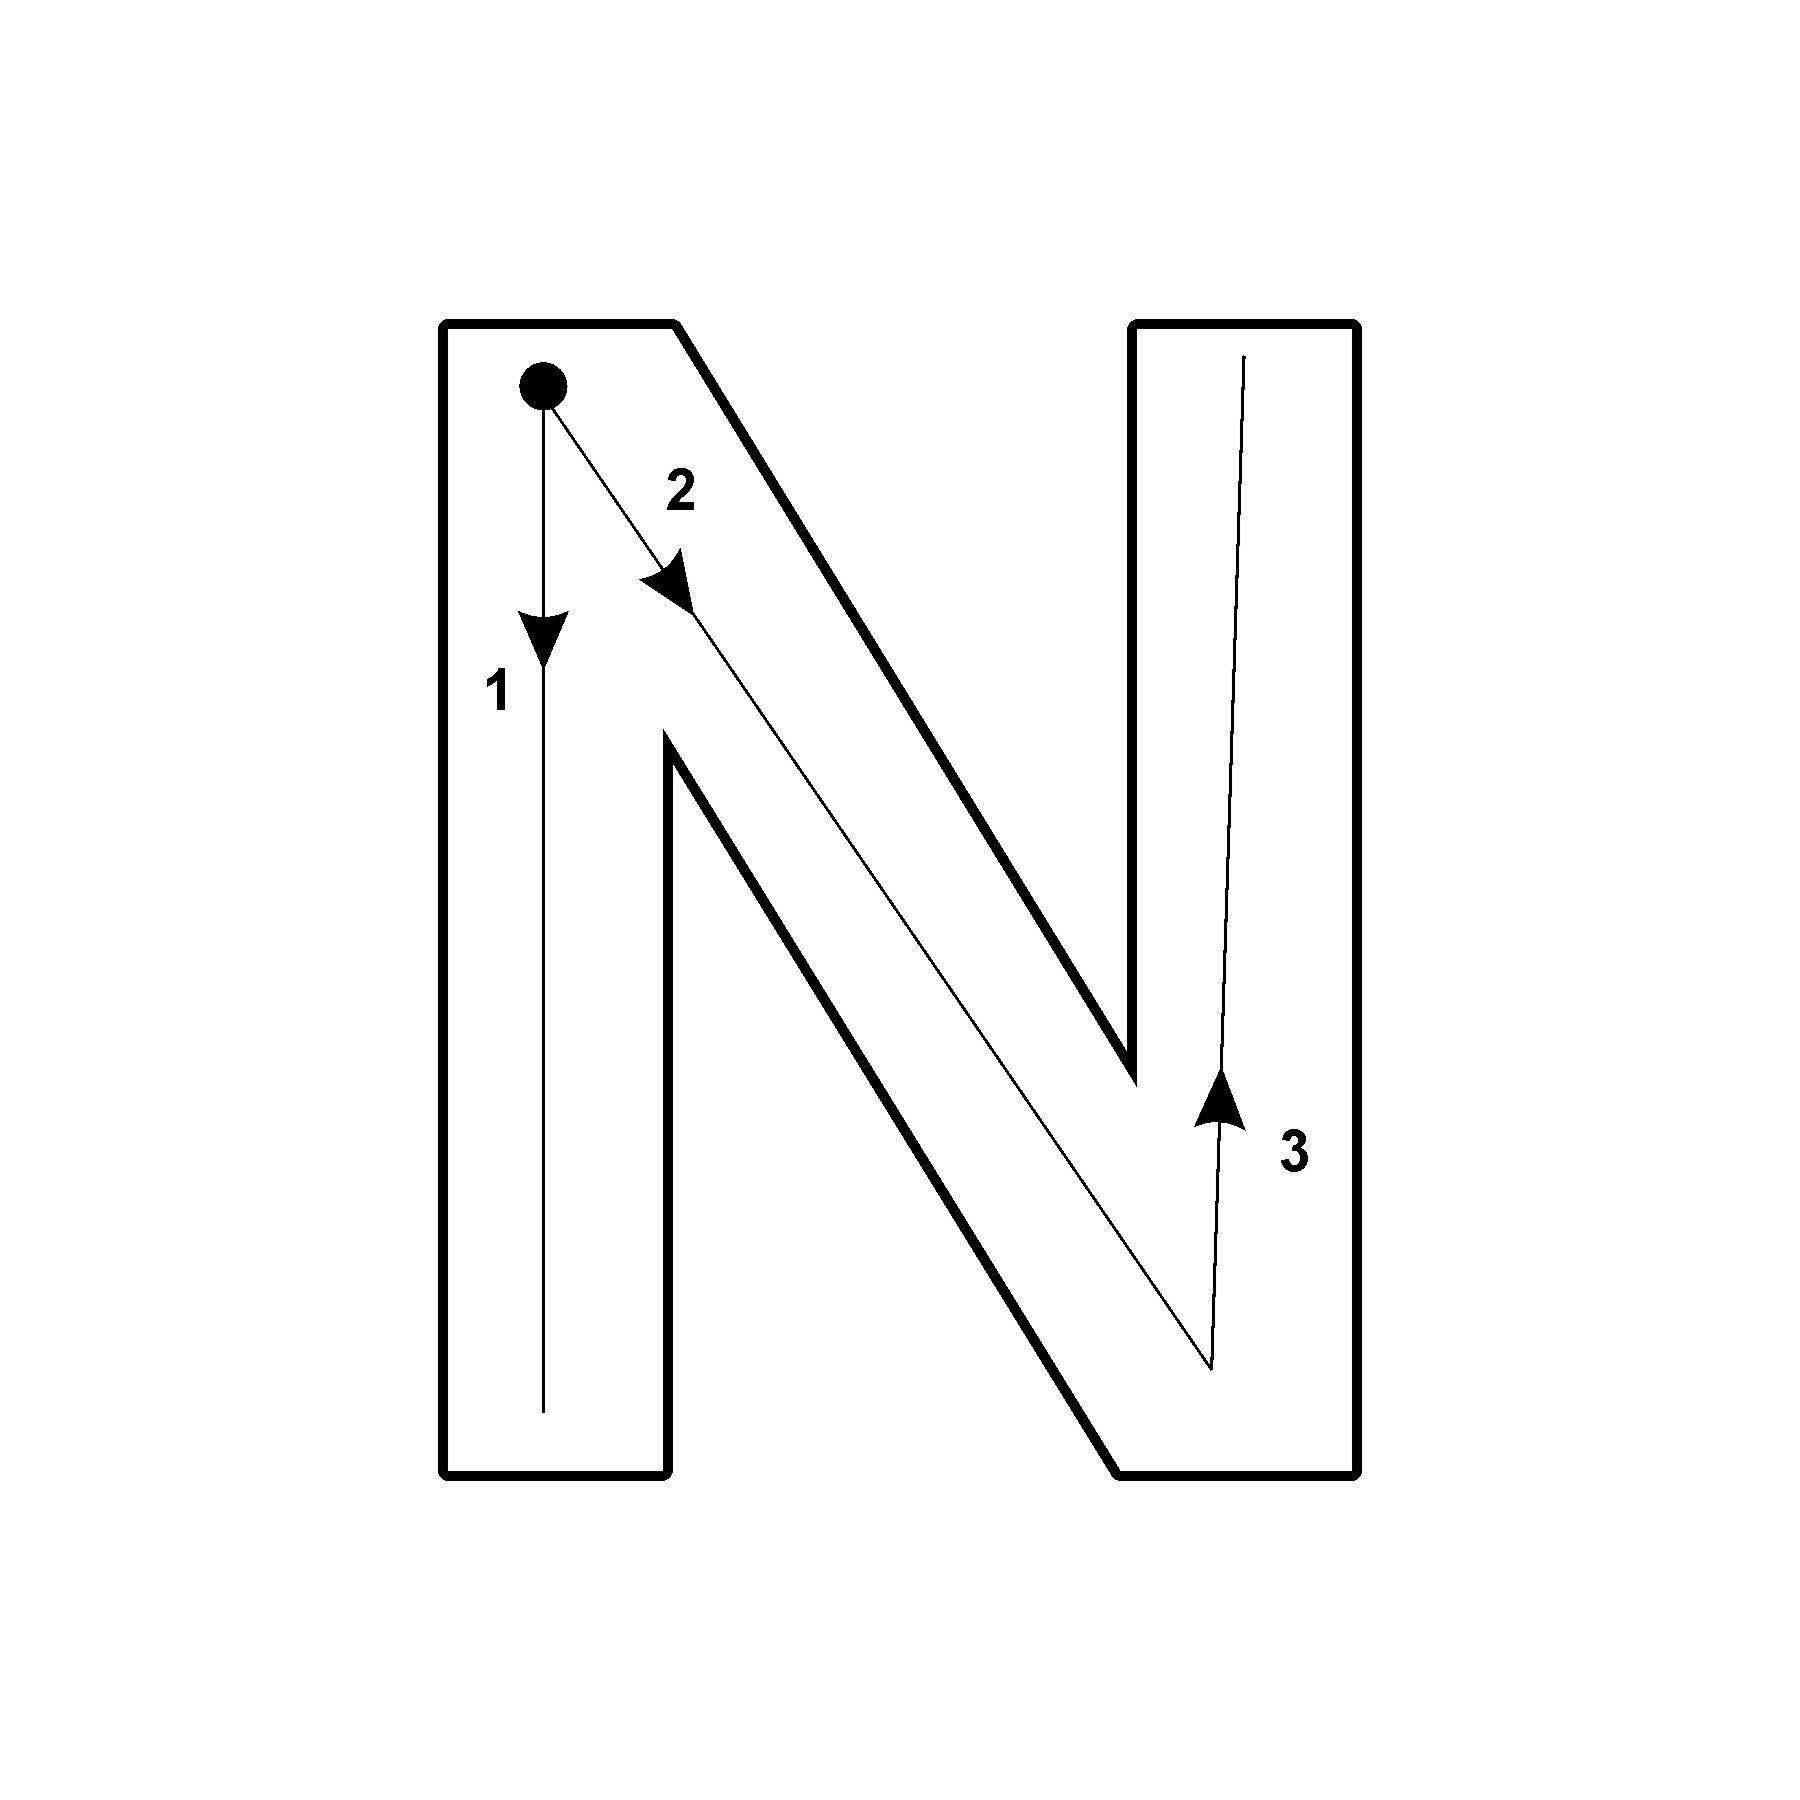 Capital Letter N With Arrow